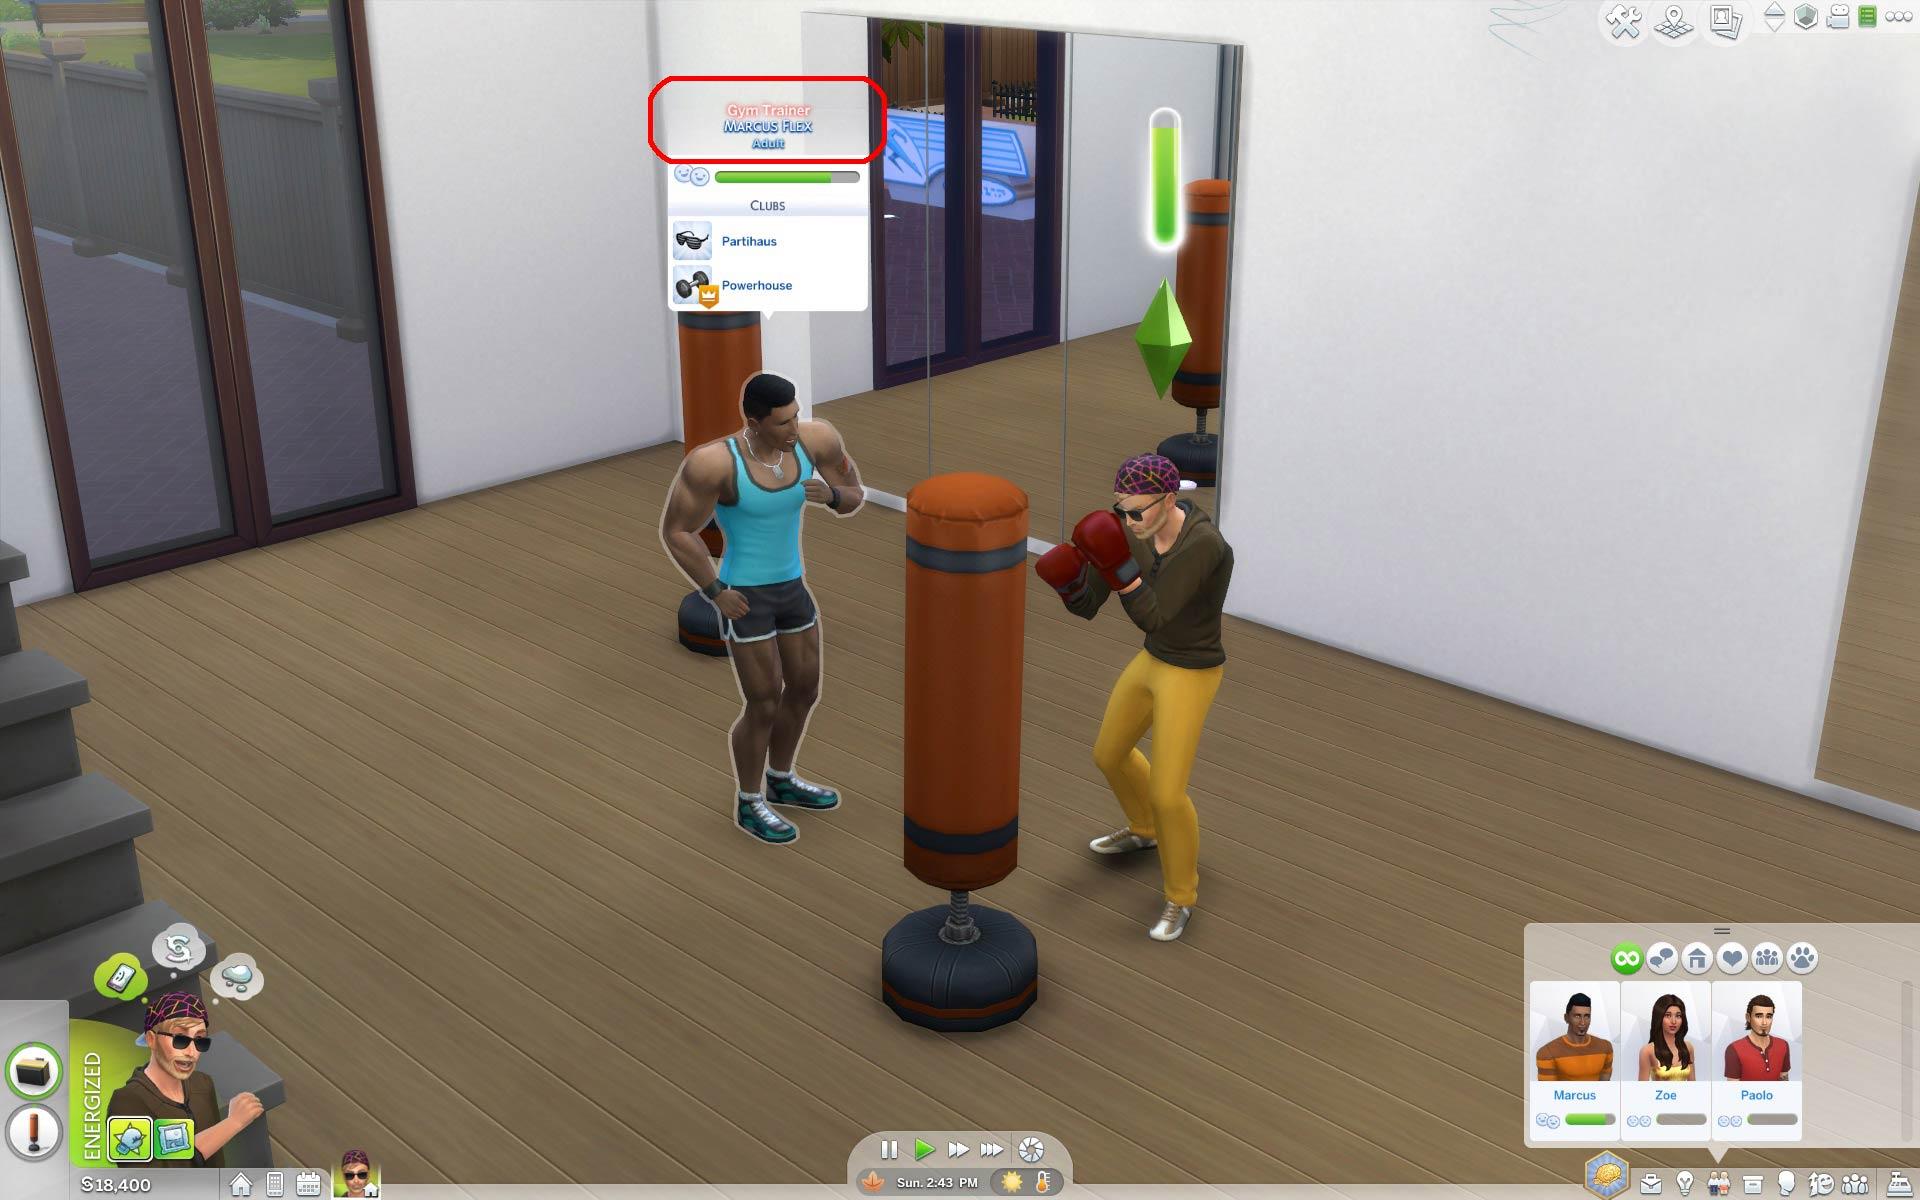 Mod The Sims - NPC Control v  1 2 2 (5 jul 2019)